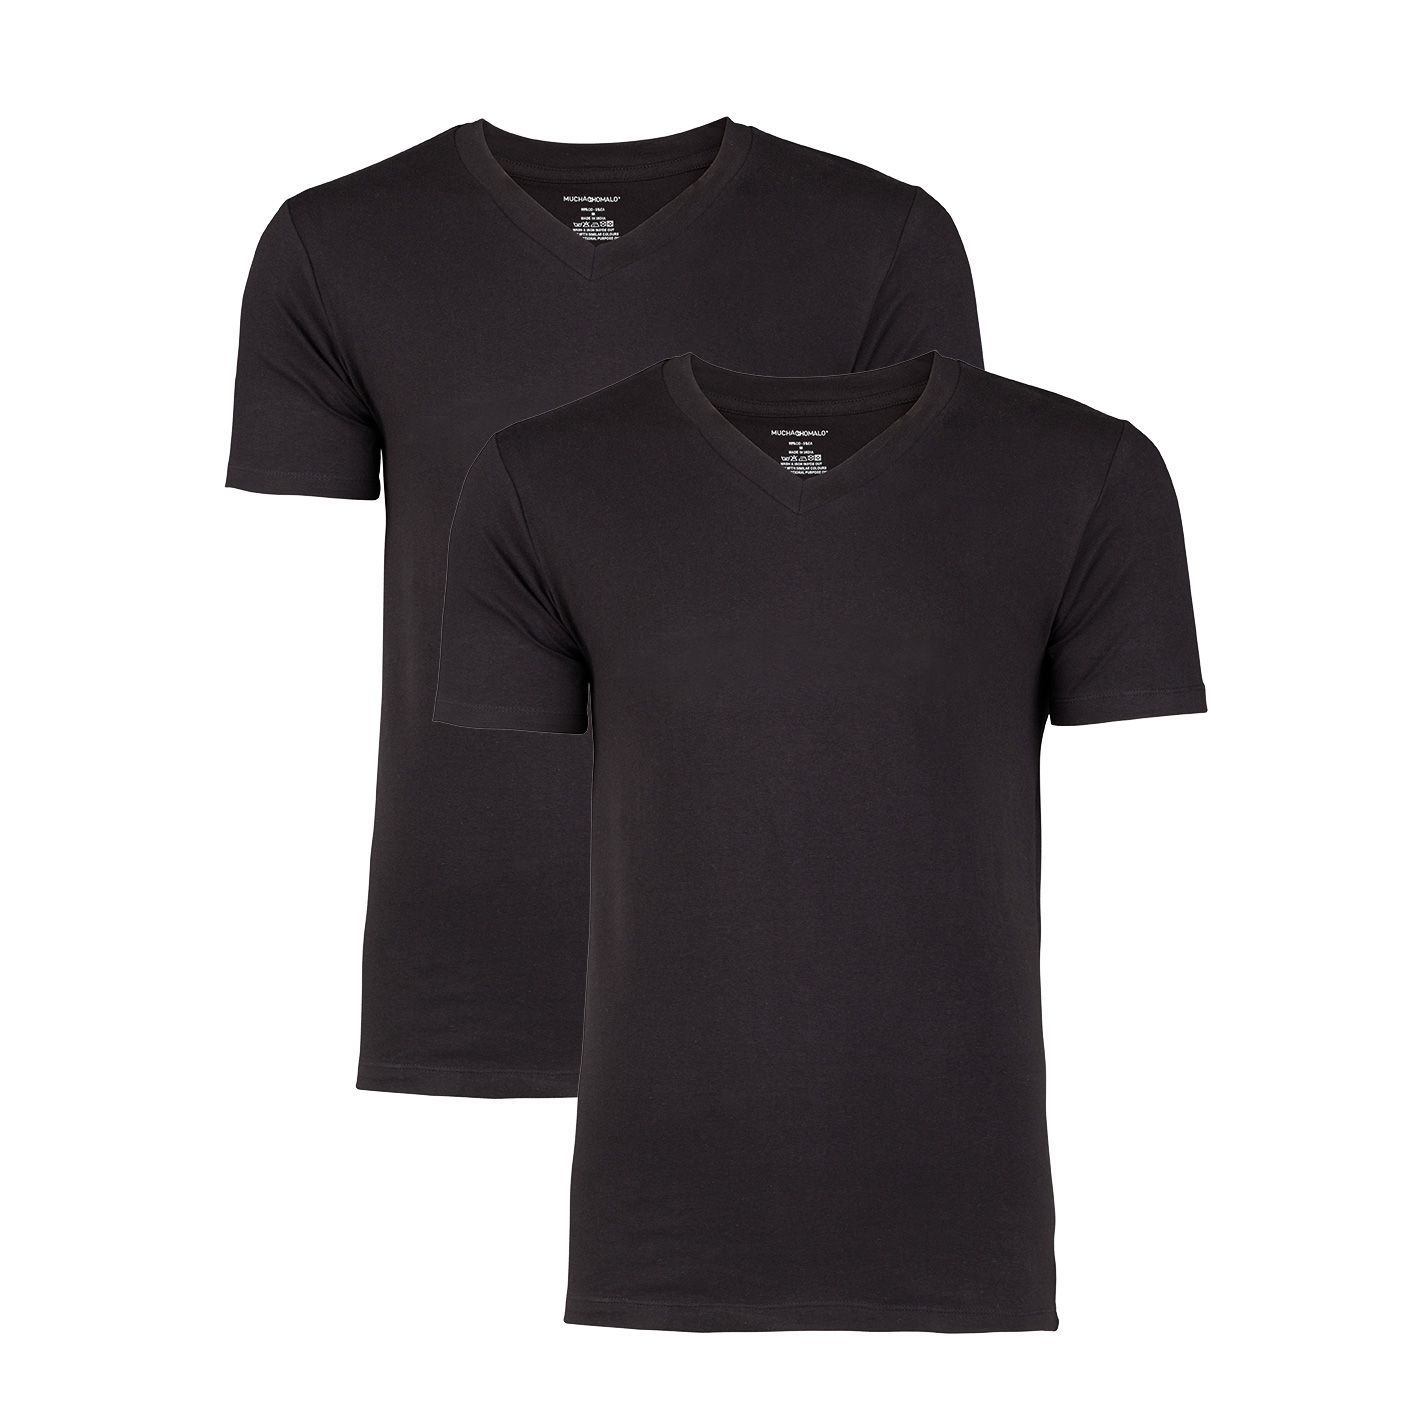 Muchachomalo 2-pack Men T-shirt Zwart